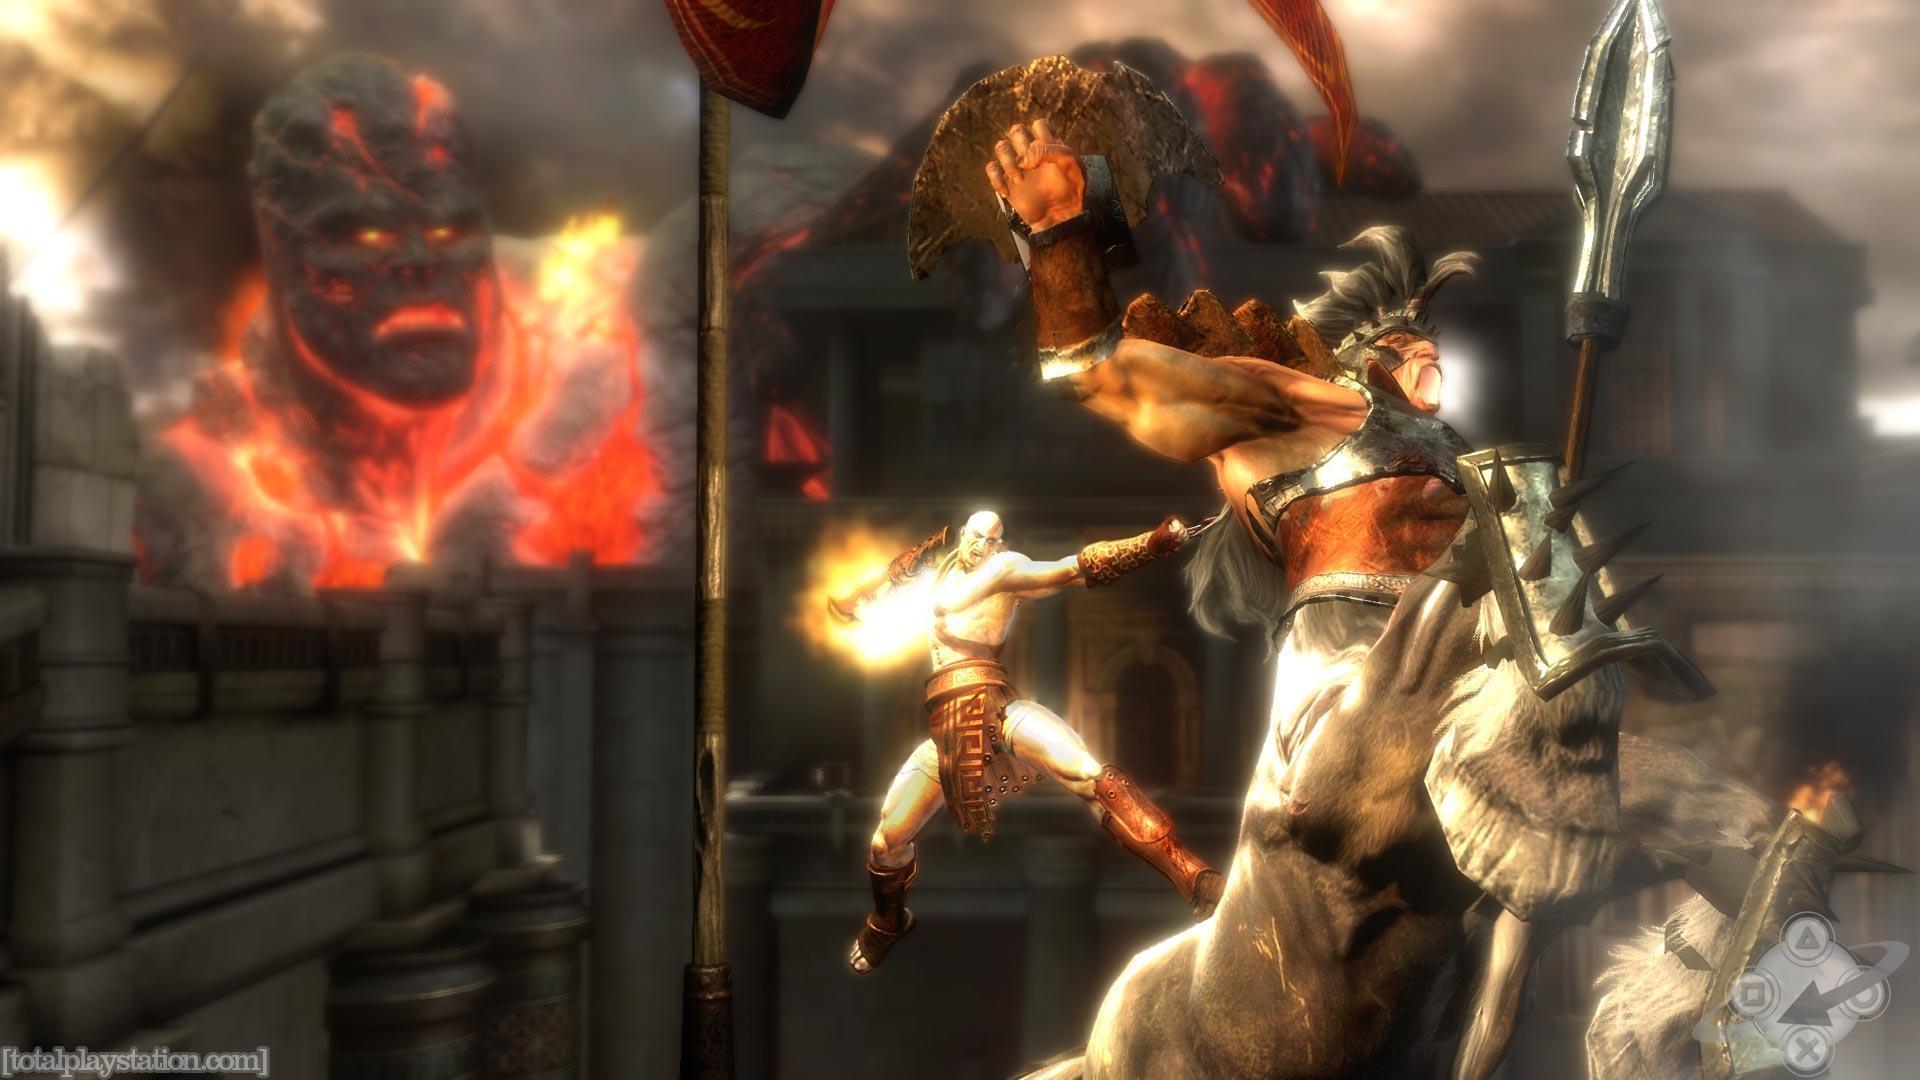 god of war 1 wallpaper hd - photo #6